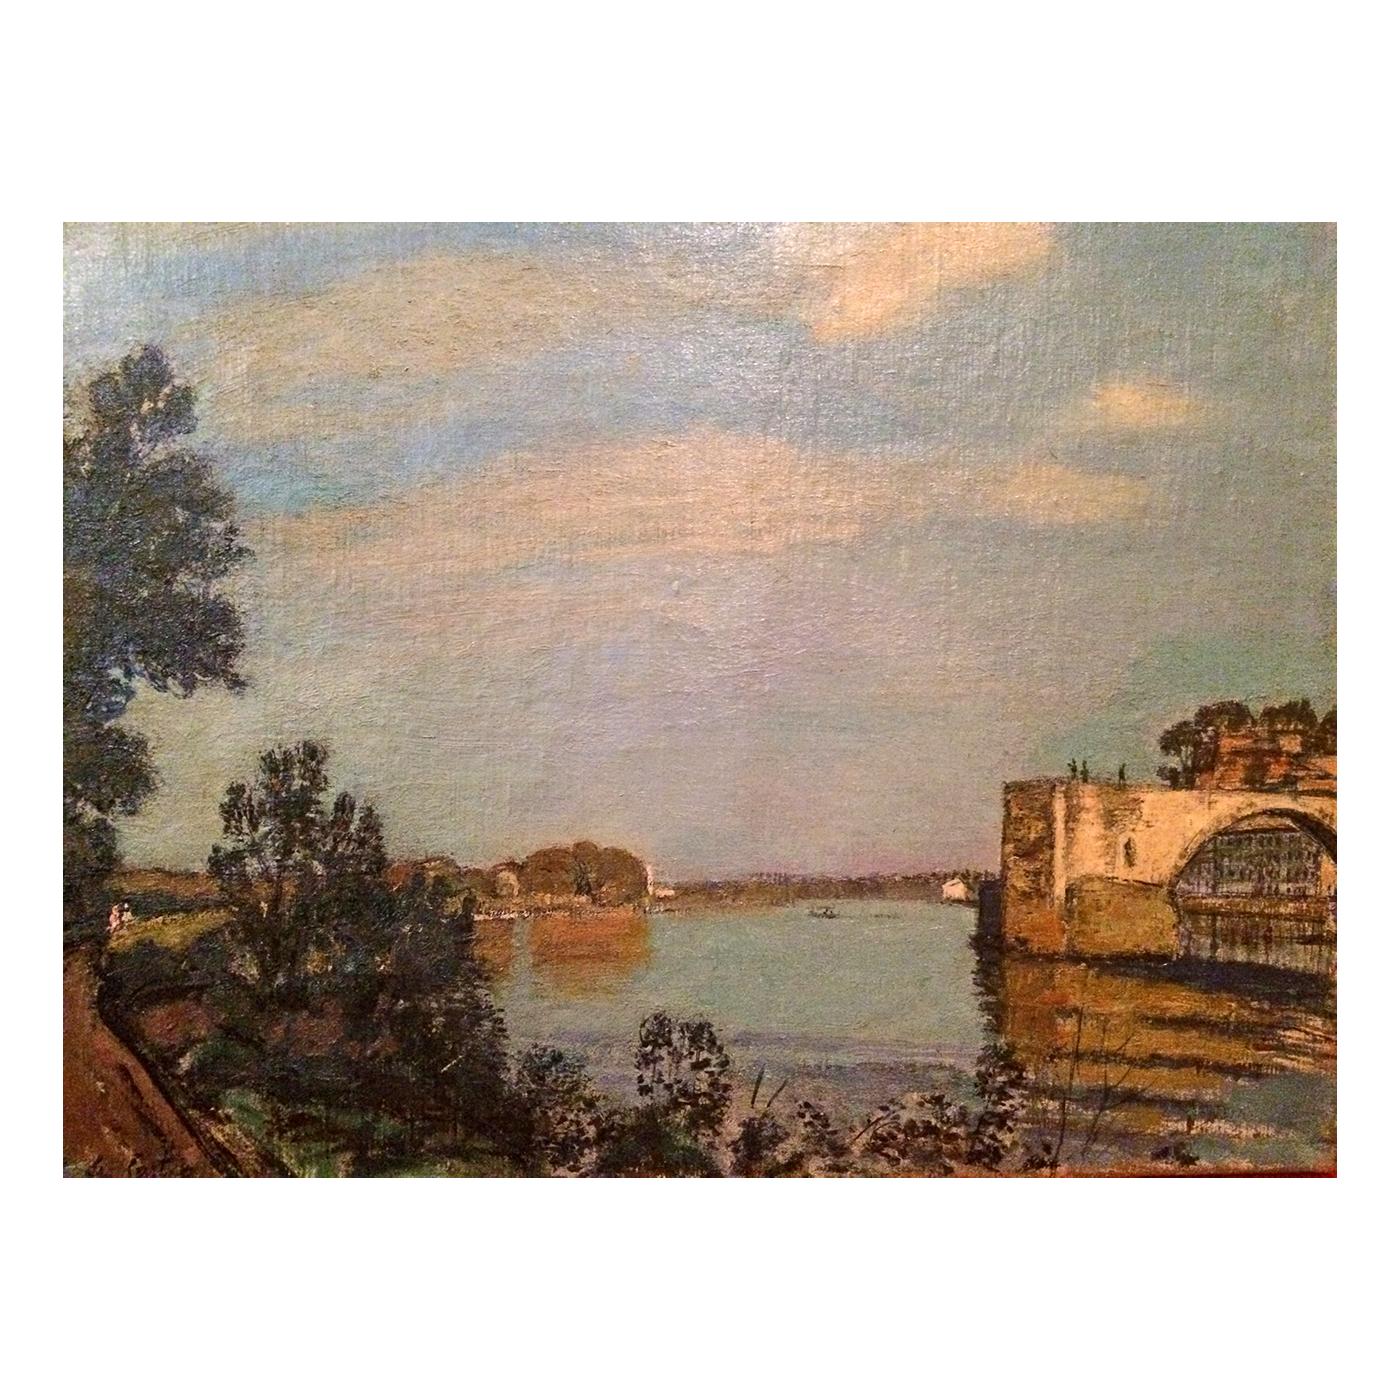 Paul de Castro (1882-1939) British/Italian artist impressionist painting Ruins along the River c.1900